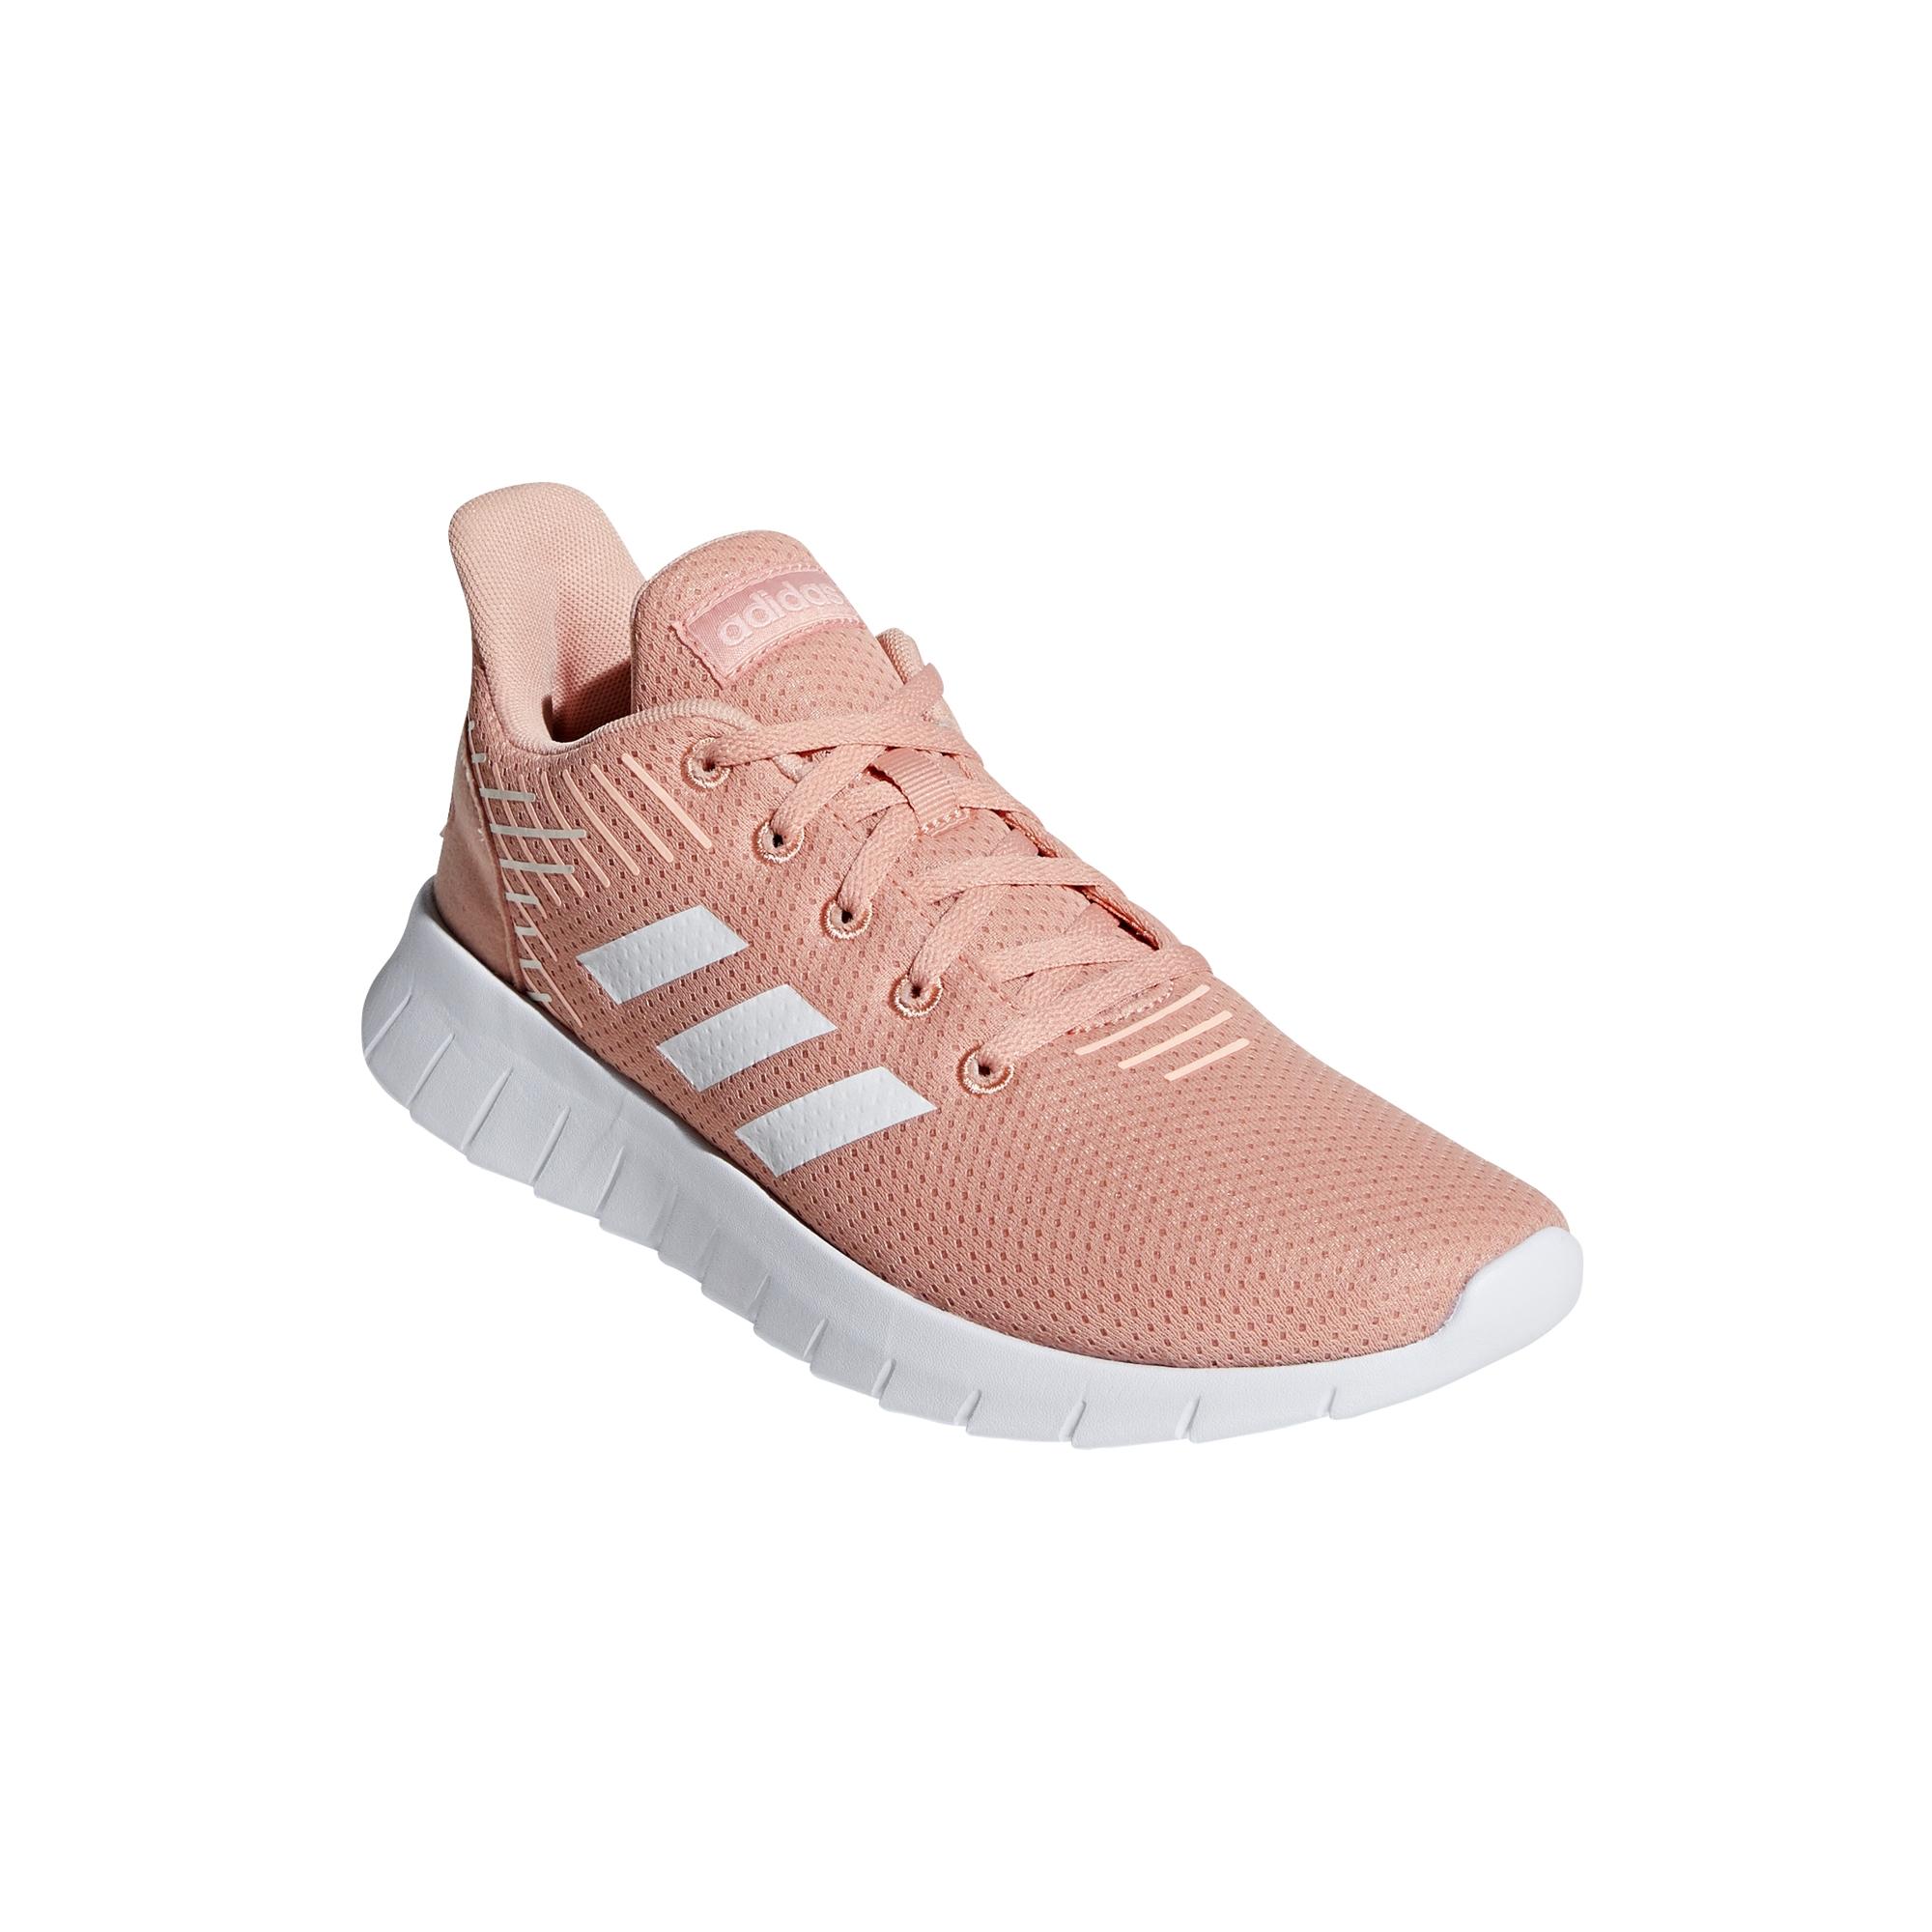 various colors cd723 d829b Chaussures femme adidas Asweerun